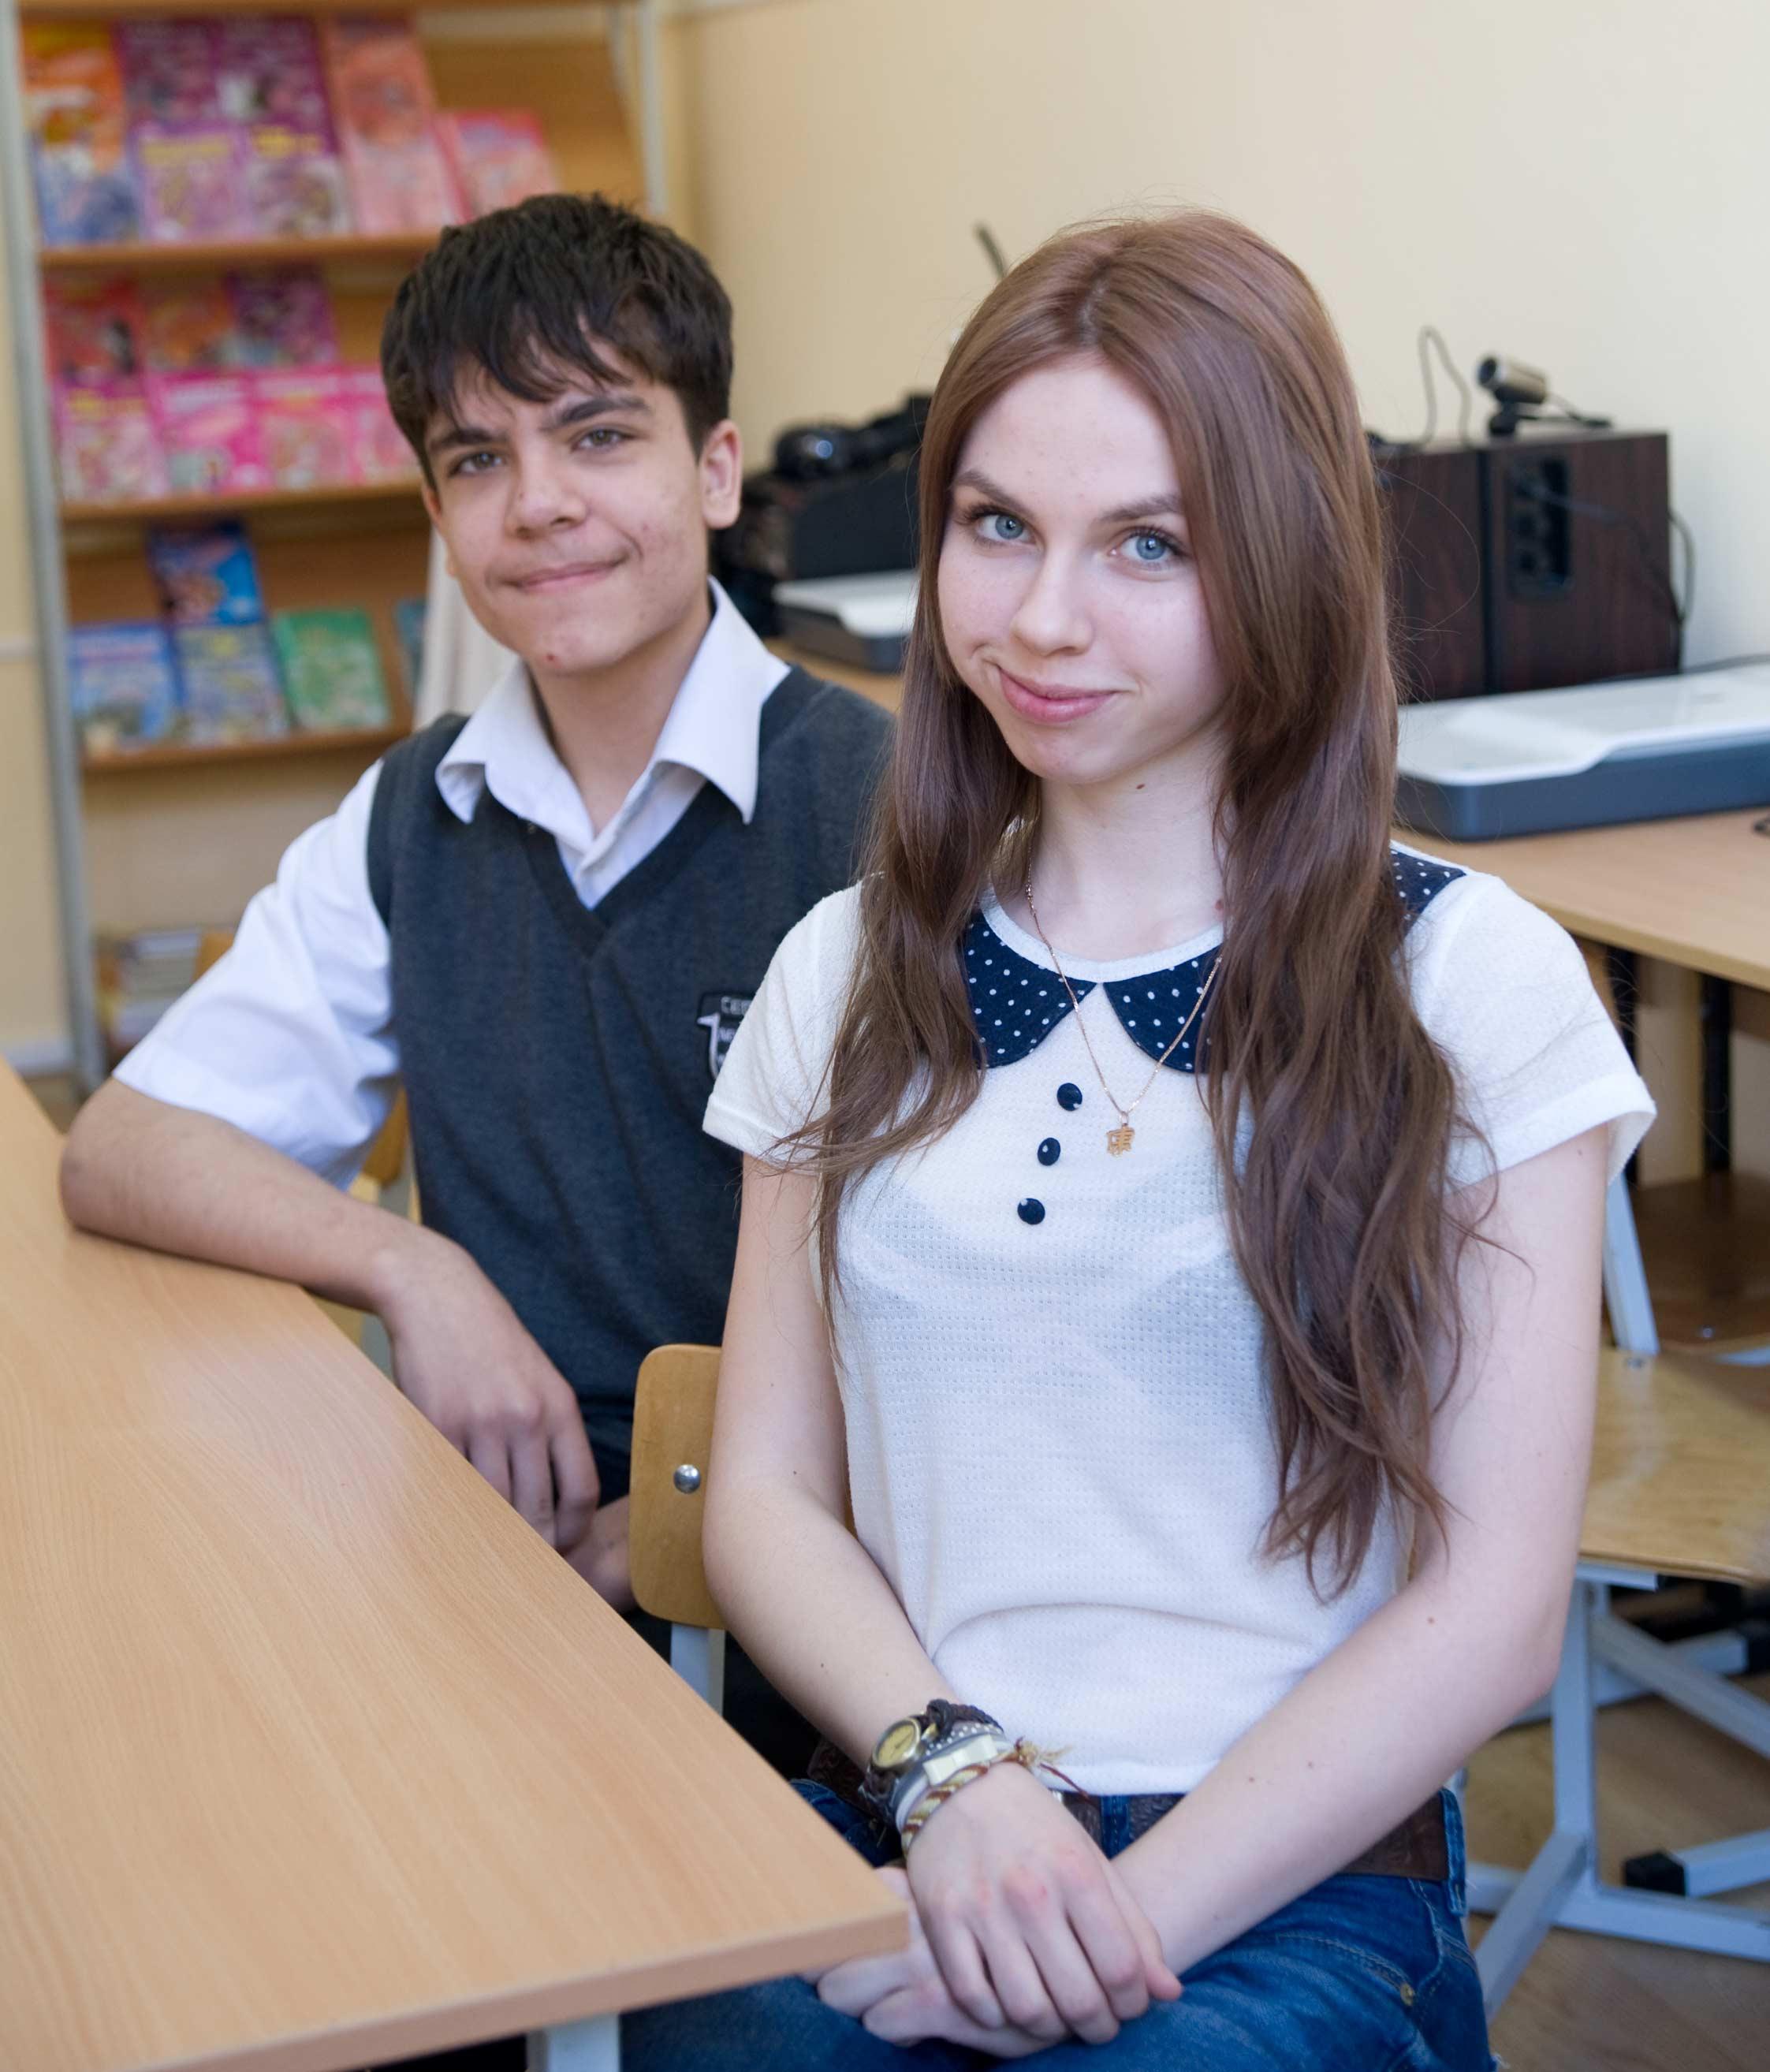 Андрей Стороженко и Элеонора Шмонденко